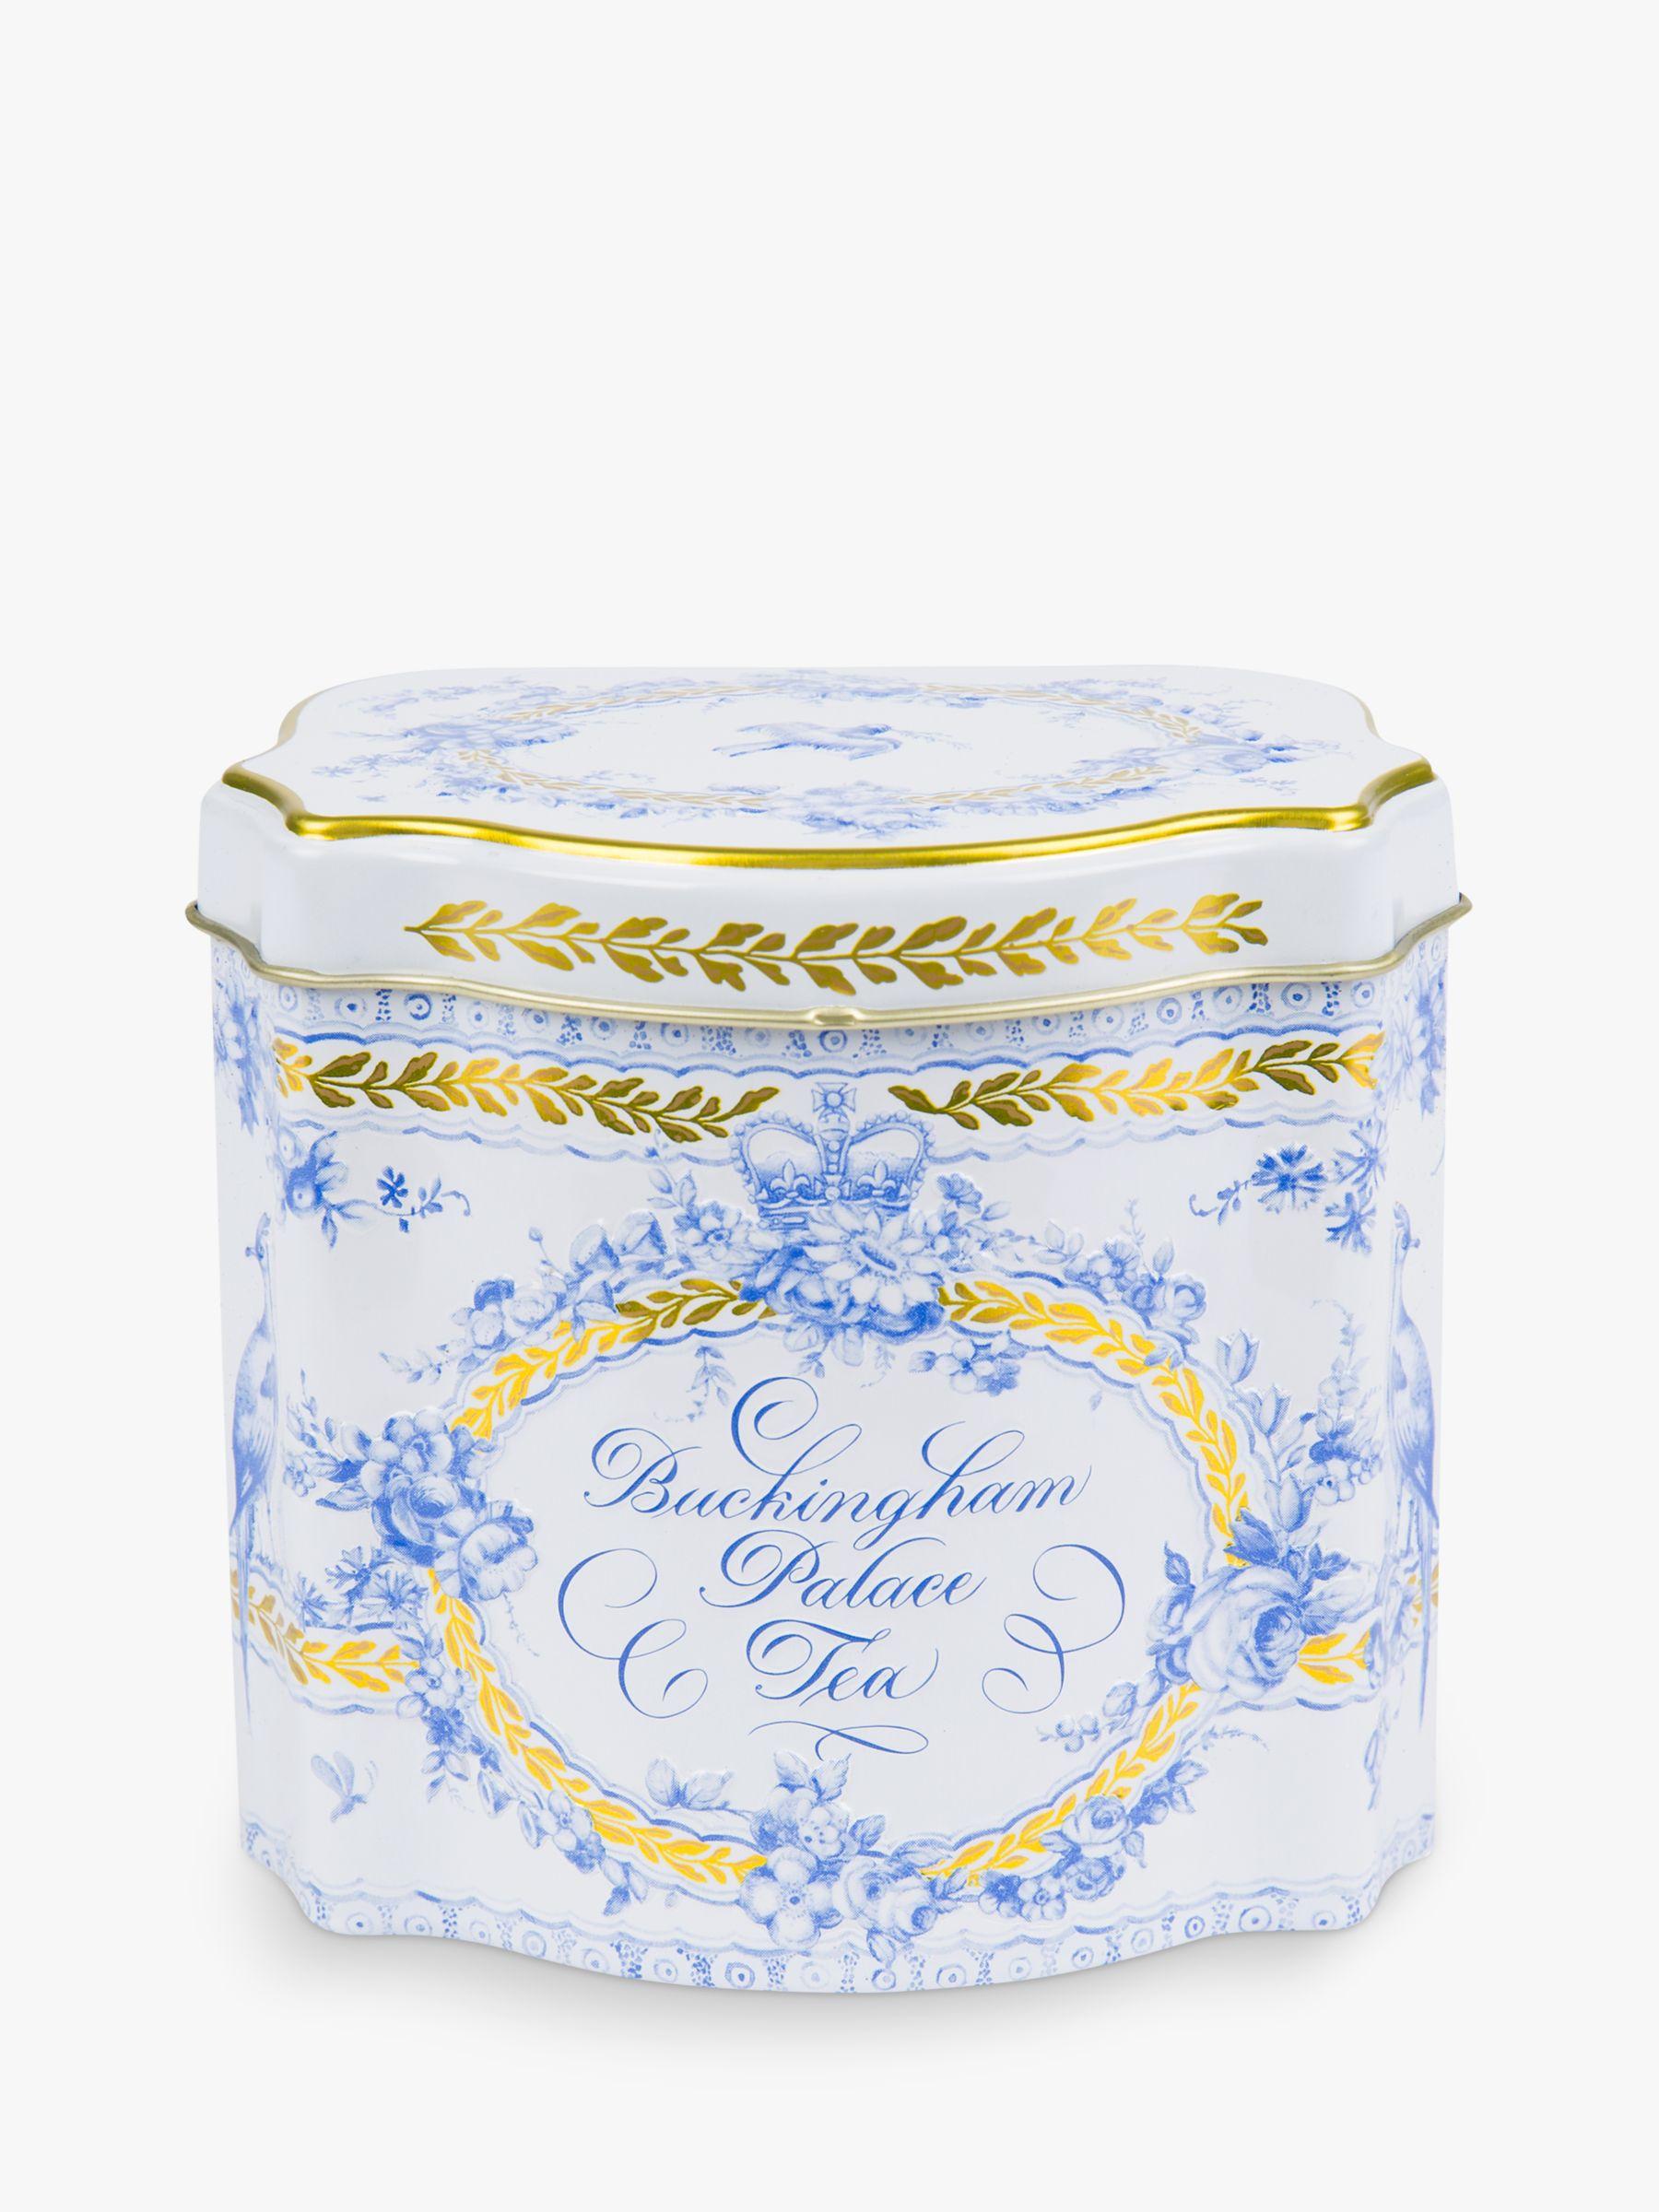 Royal Collection Royal Collection Buckingham Palace Tea Caddy, 125g